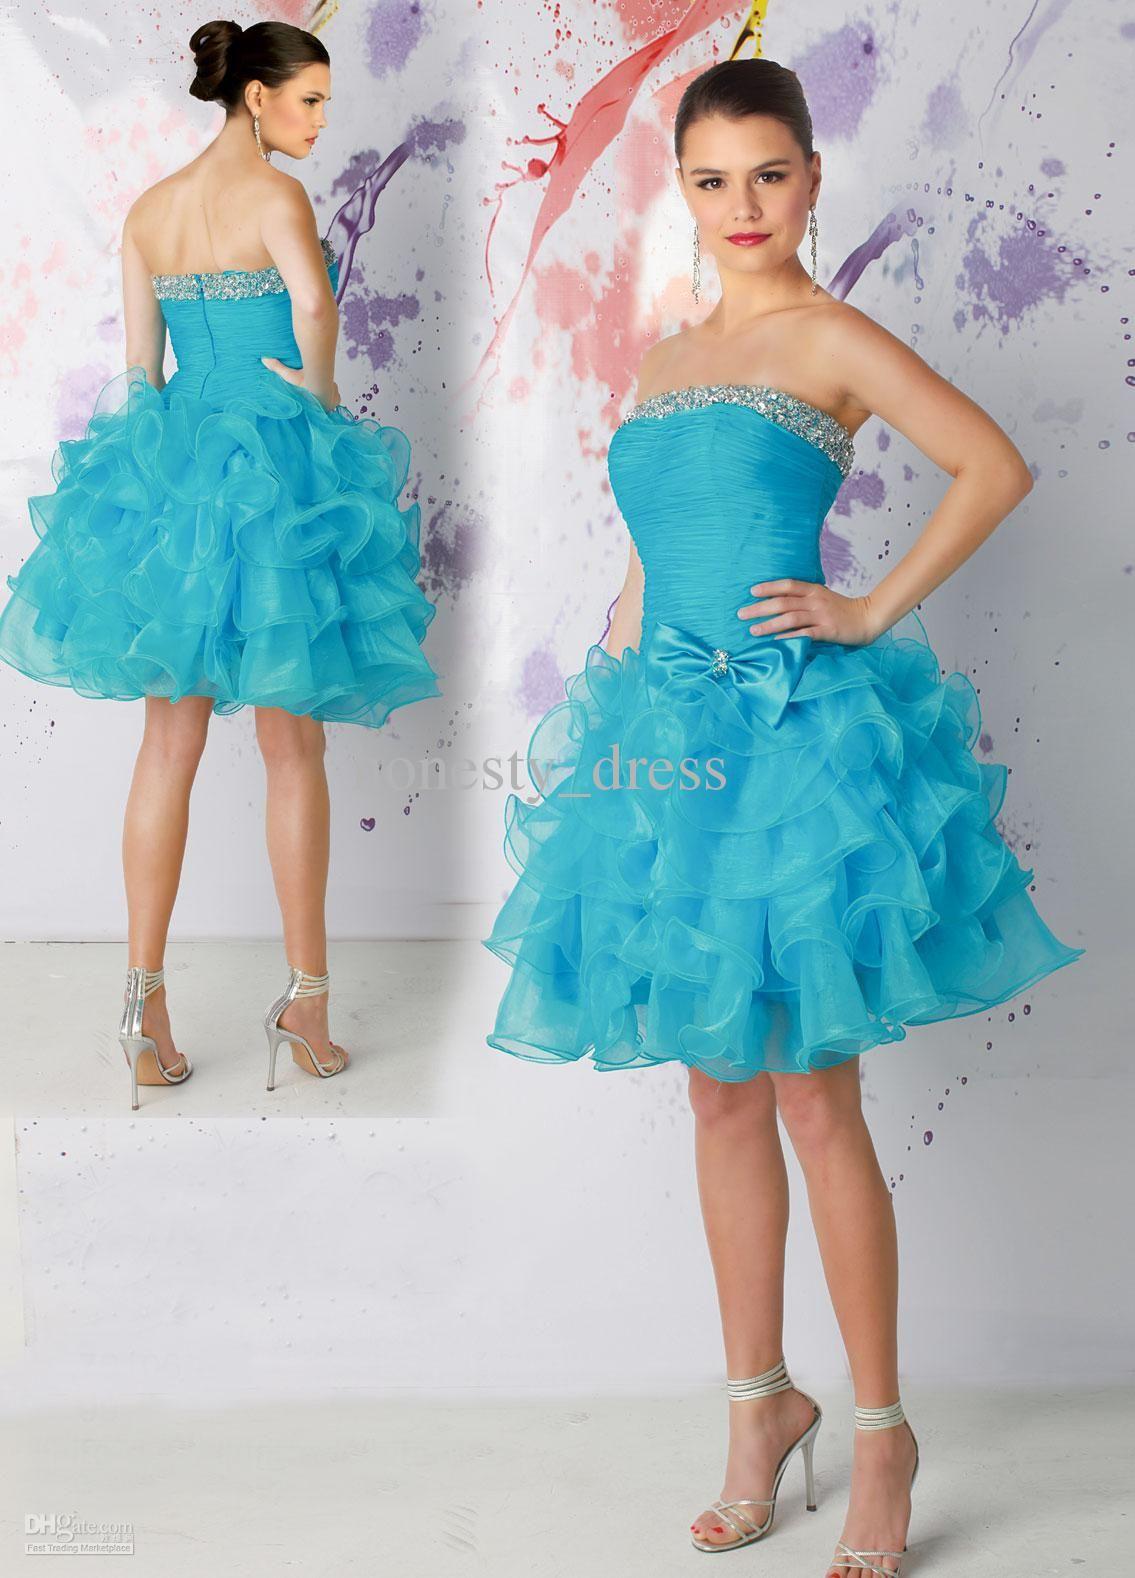 Pin by liu aaron on aaron pinterest homecoming dresses